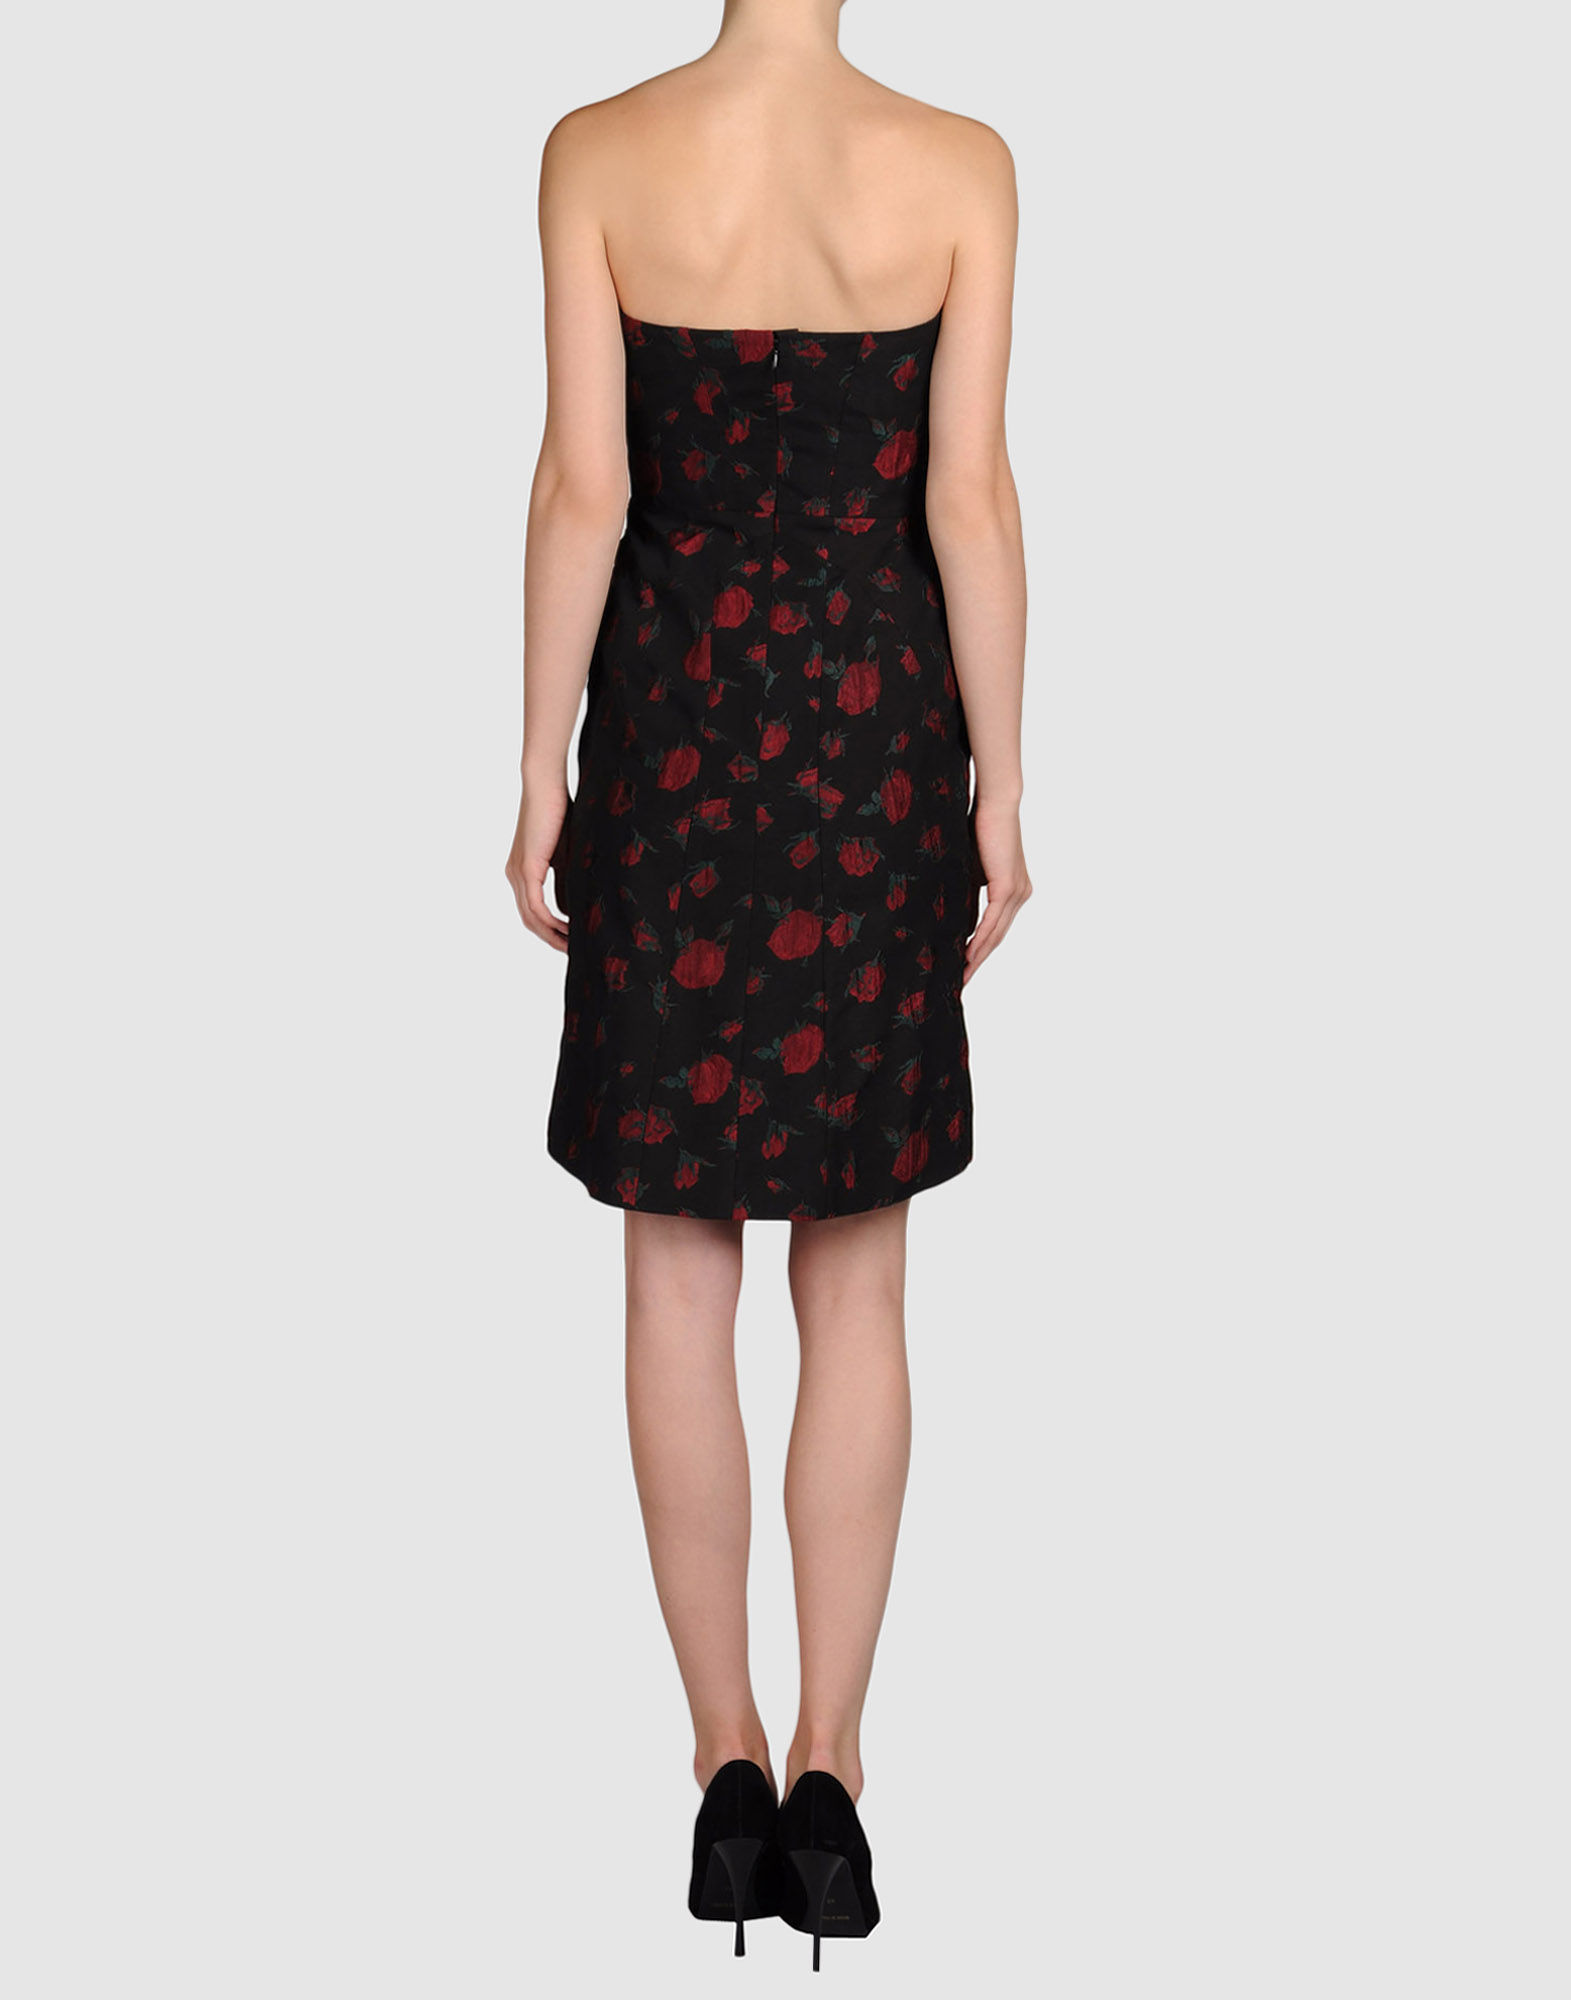 34219208QW 14 r - Βραδυνα Φορεματα Yves Saint Laurent Rive Gauche Κωδ.27